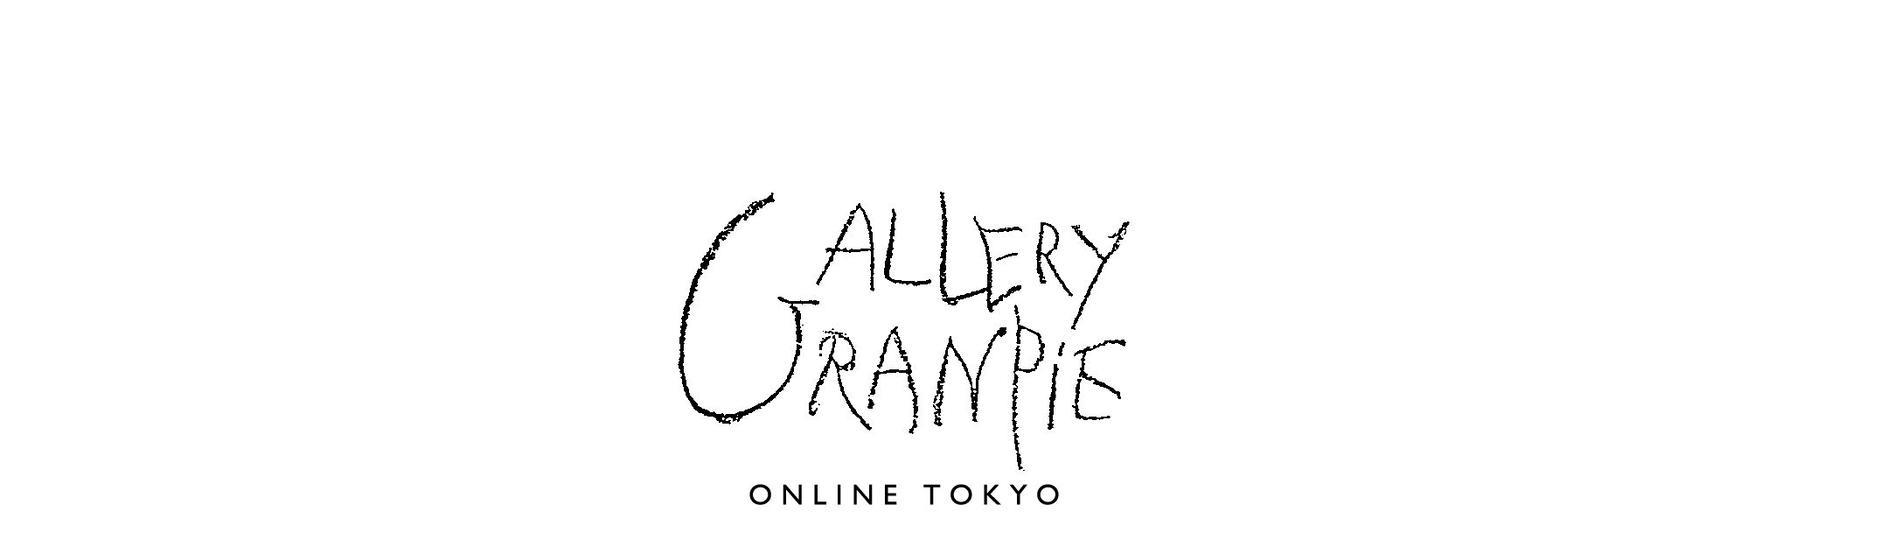 GALLERY GRANPIE online Tokyo